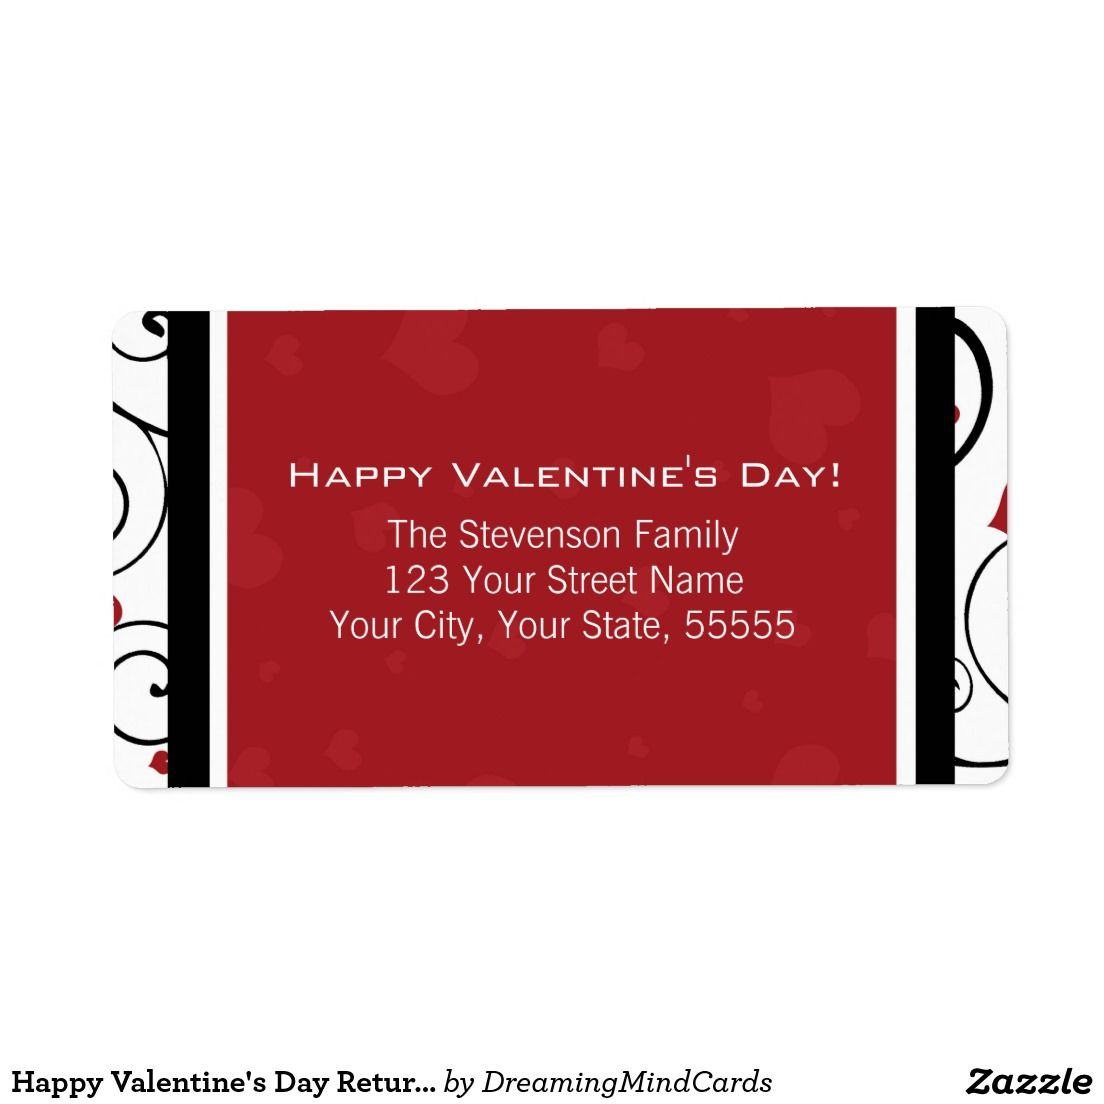 Happy Valentines Day Return Address Labels Red Pinterest Return - Custom shipping label template